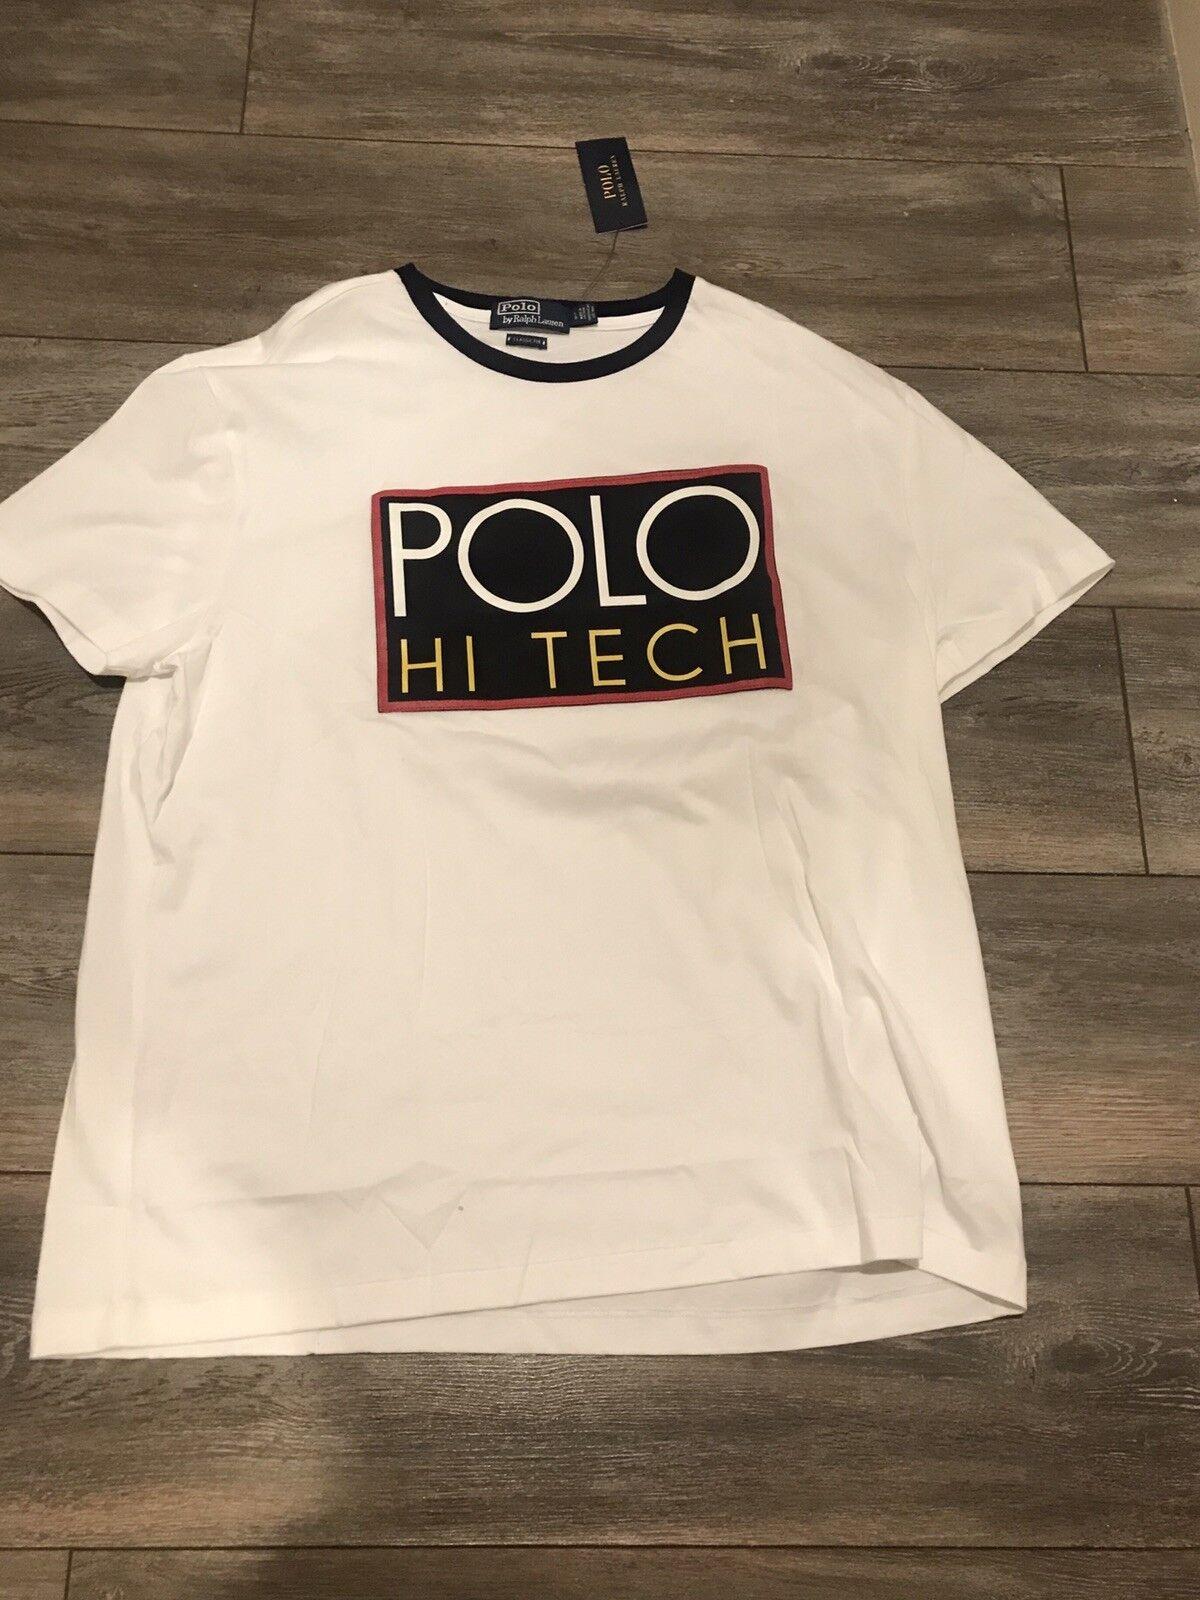 Brand New Ralph Lauren Polo Hi Tech White T Shirt Size L